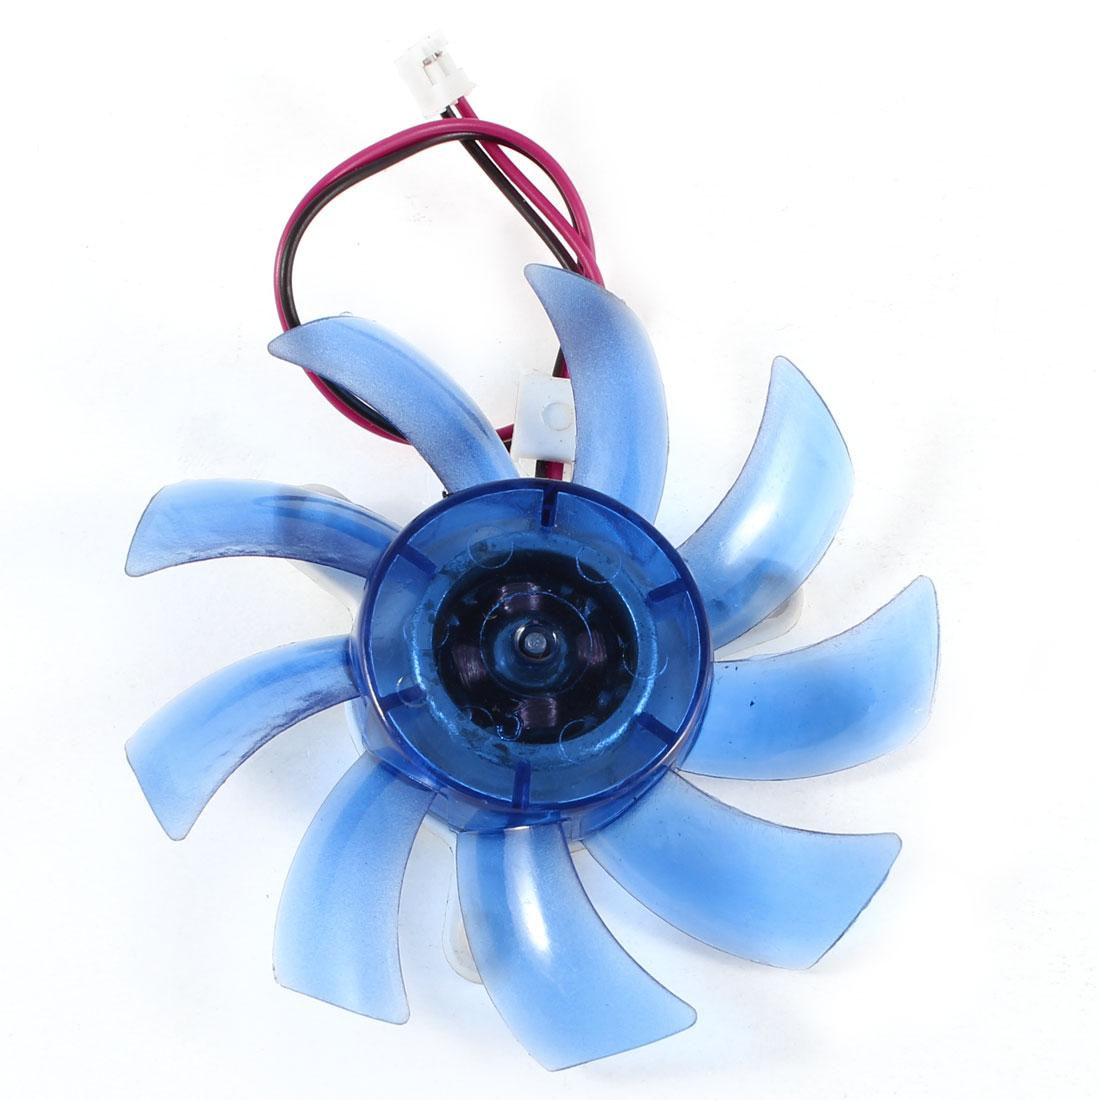 PC Computer VGA Video Card Heatsink Cooler Cooling Fan Blue 75mm 2 Terminal DC 12V